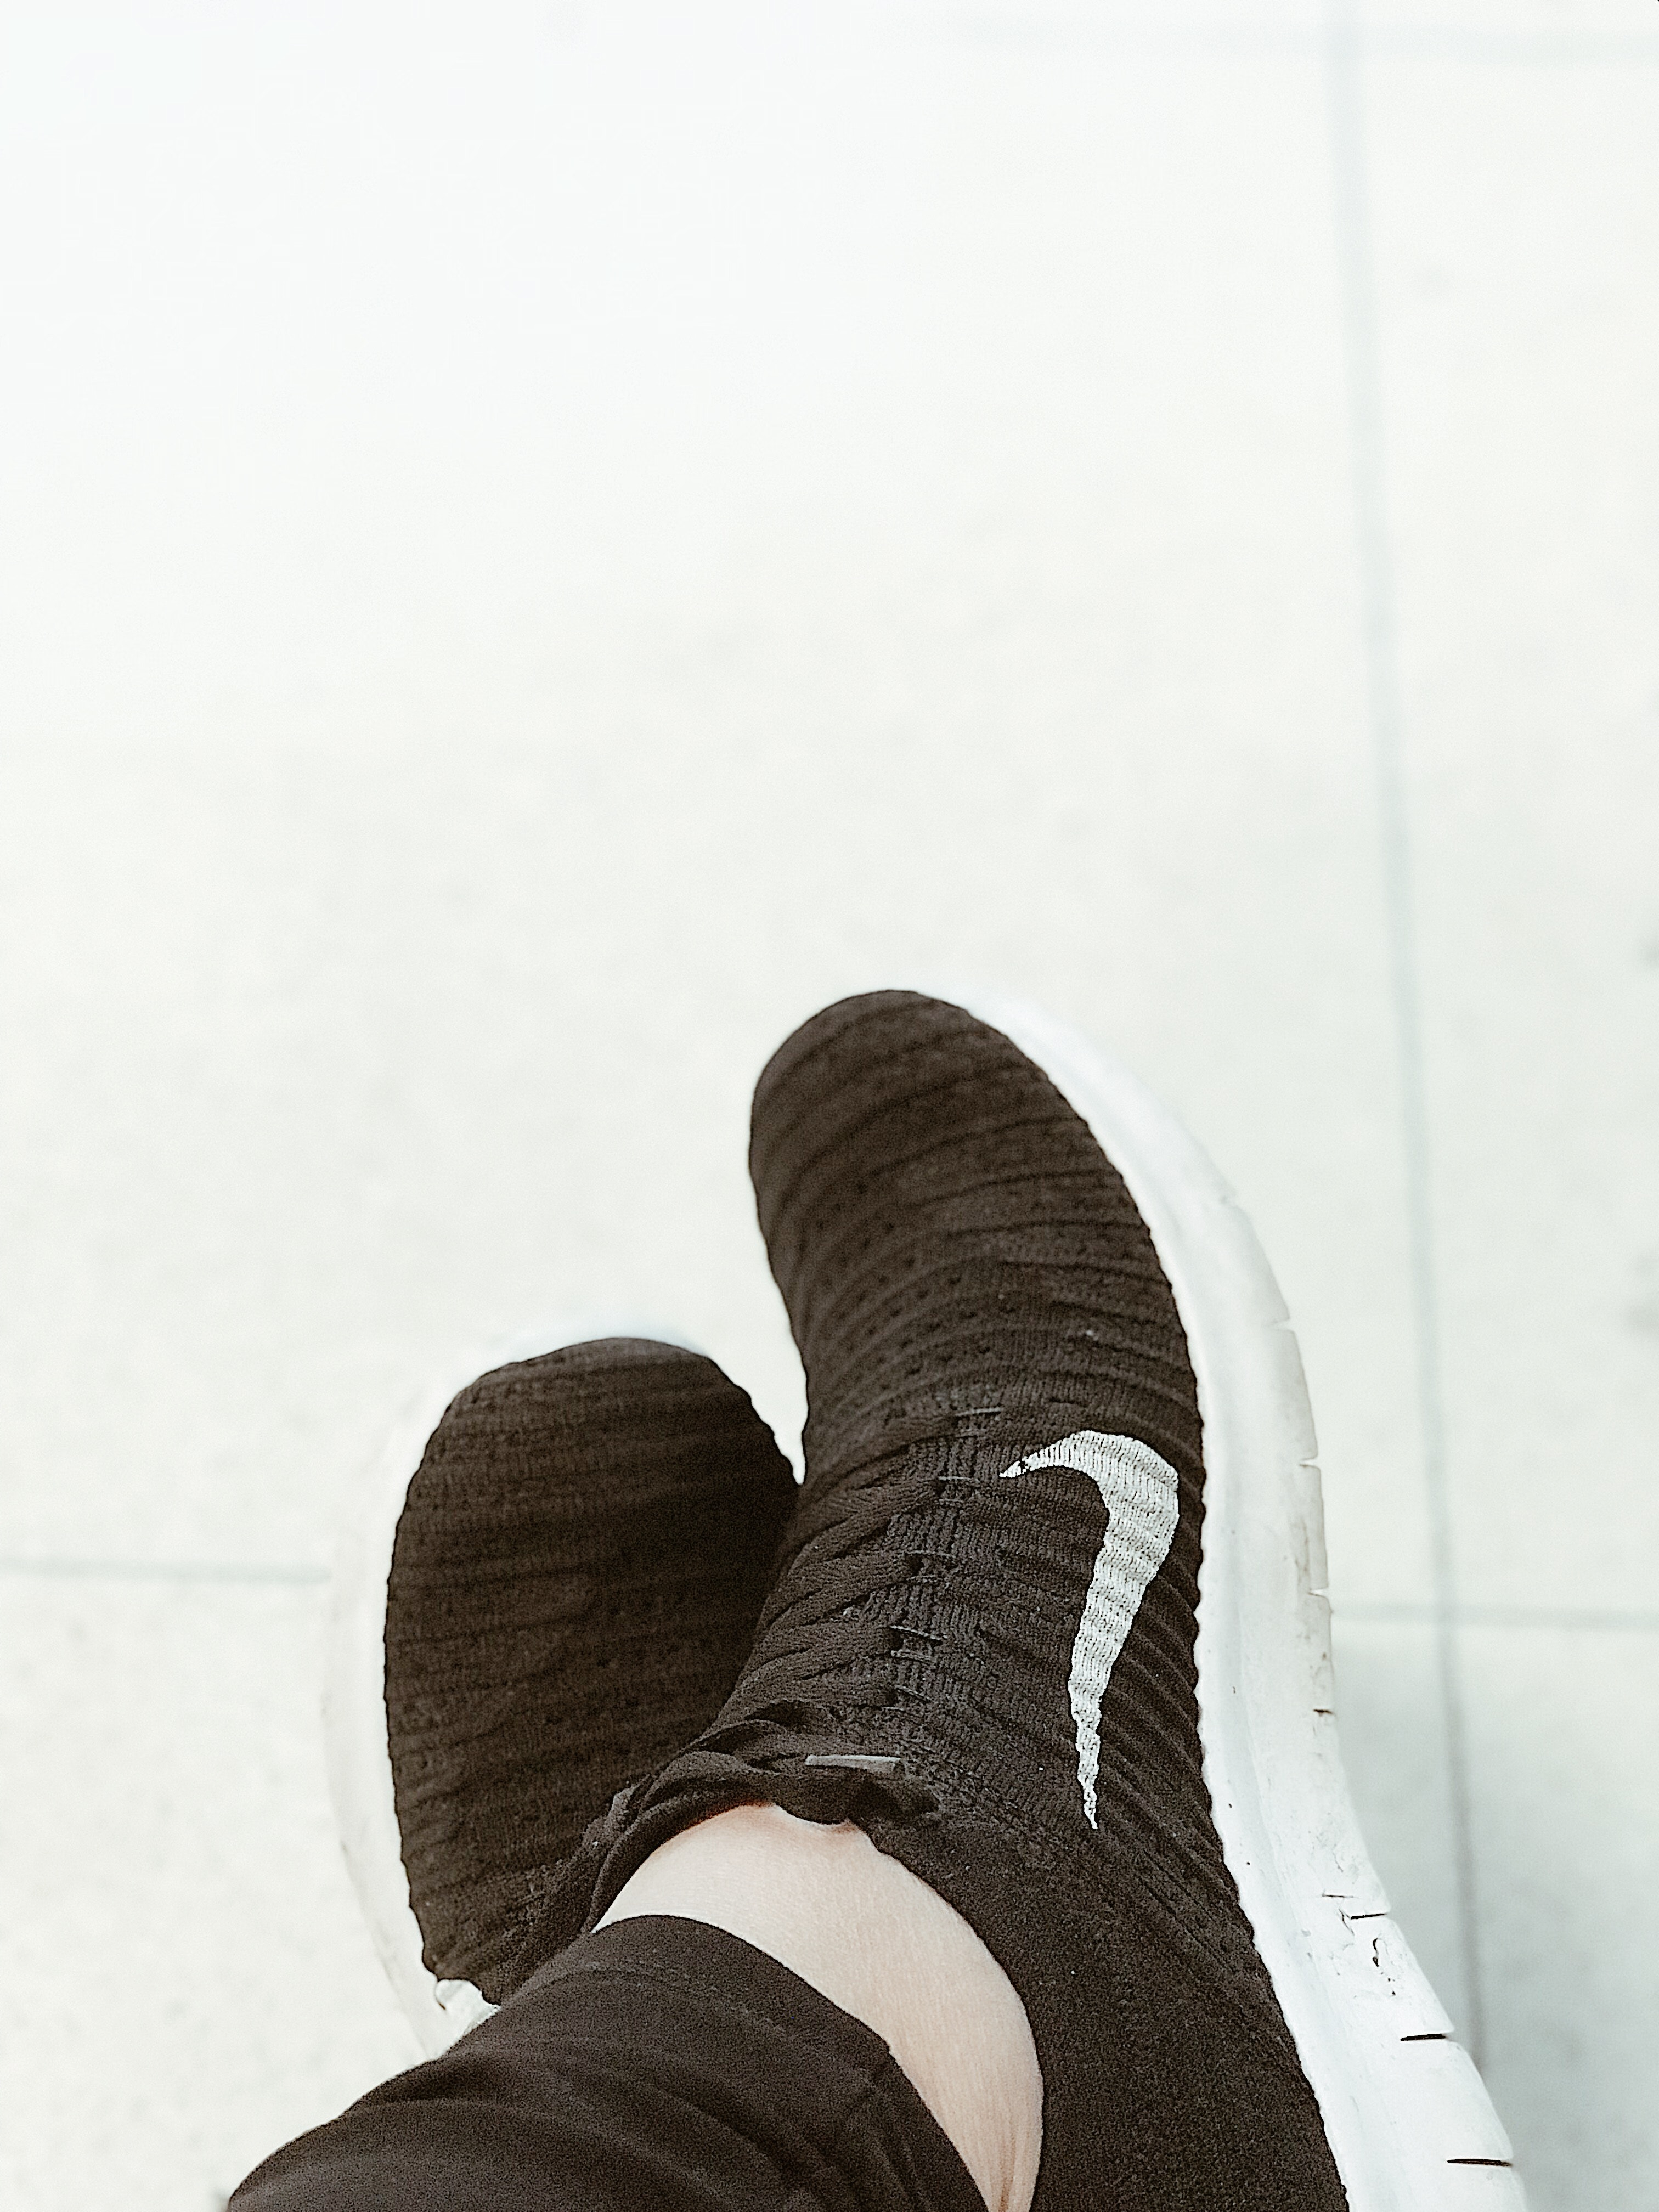 Nike Running Shoes, Fashion, Feet, Footwear, Nike, HQ Photo